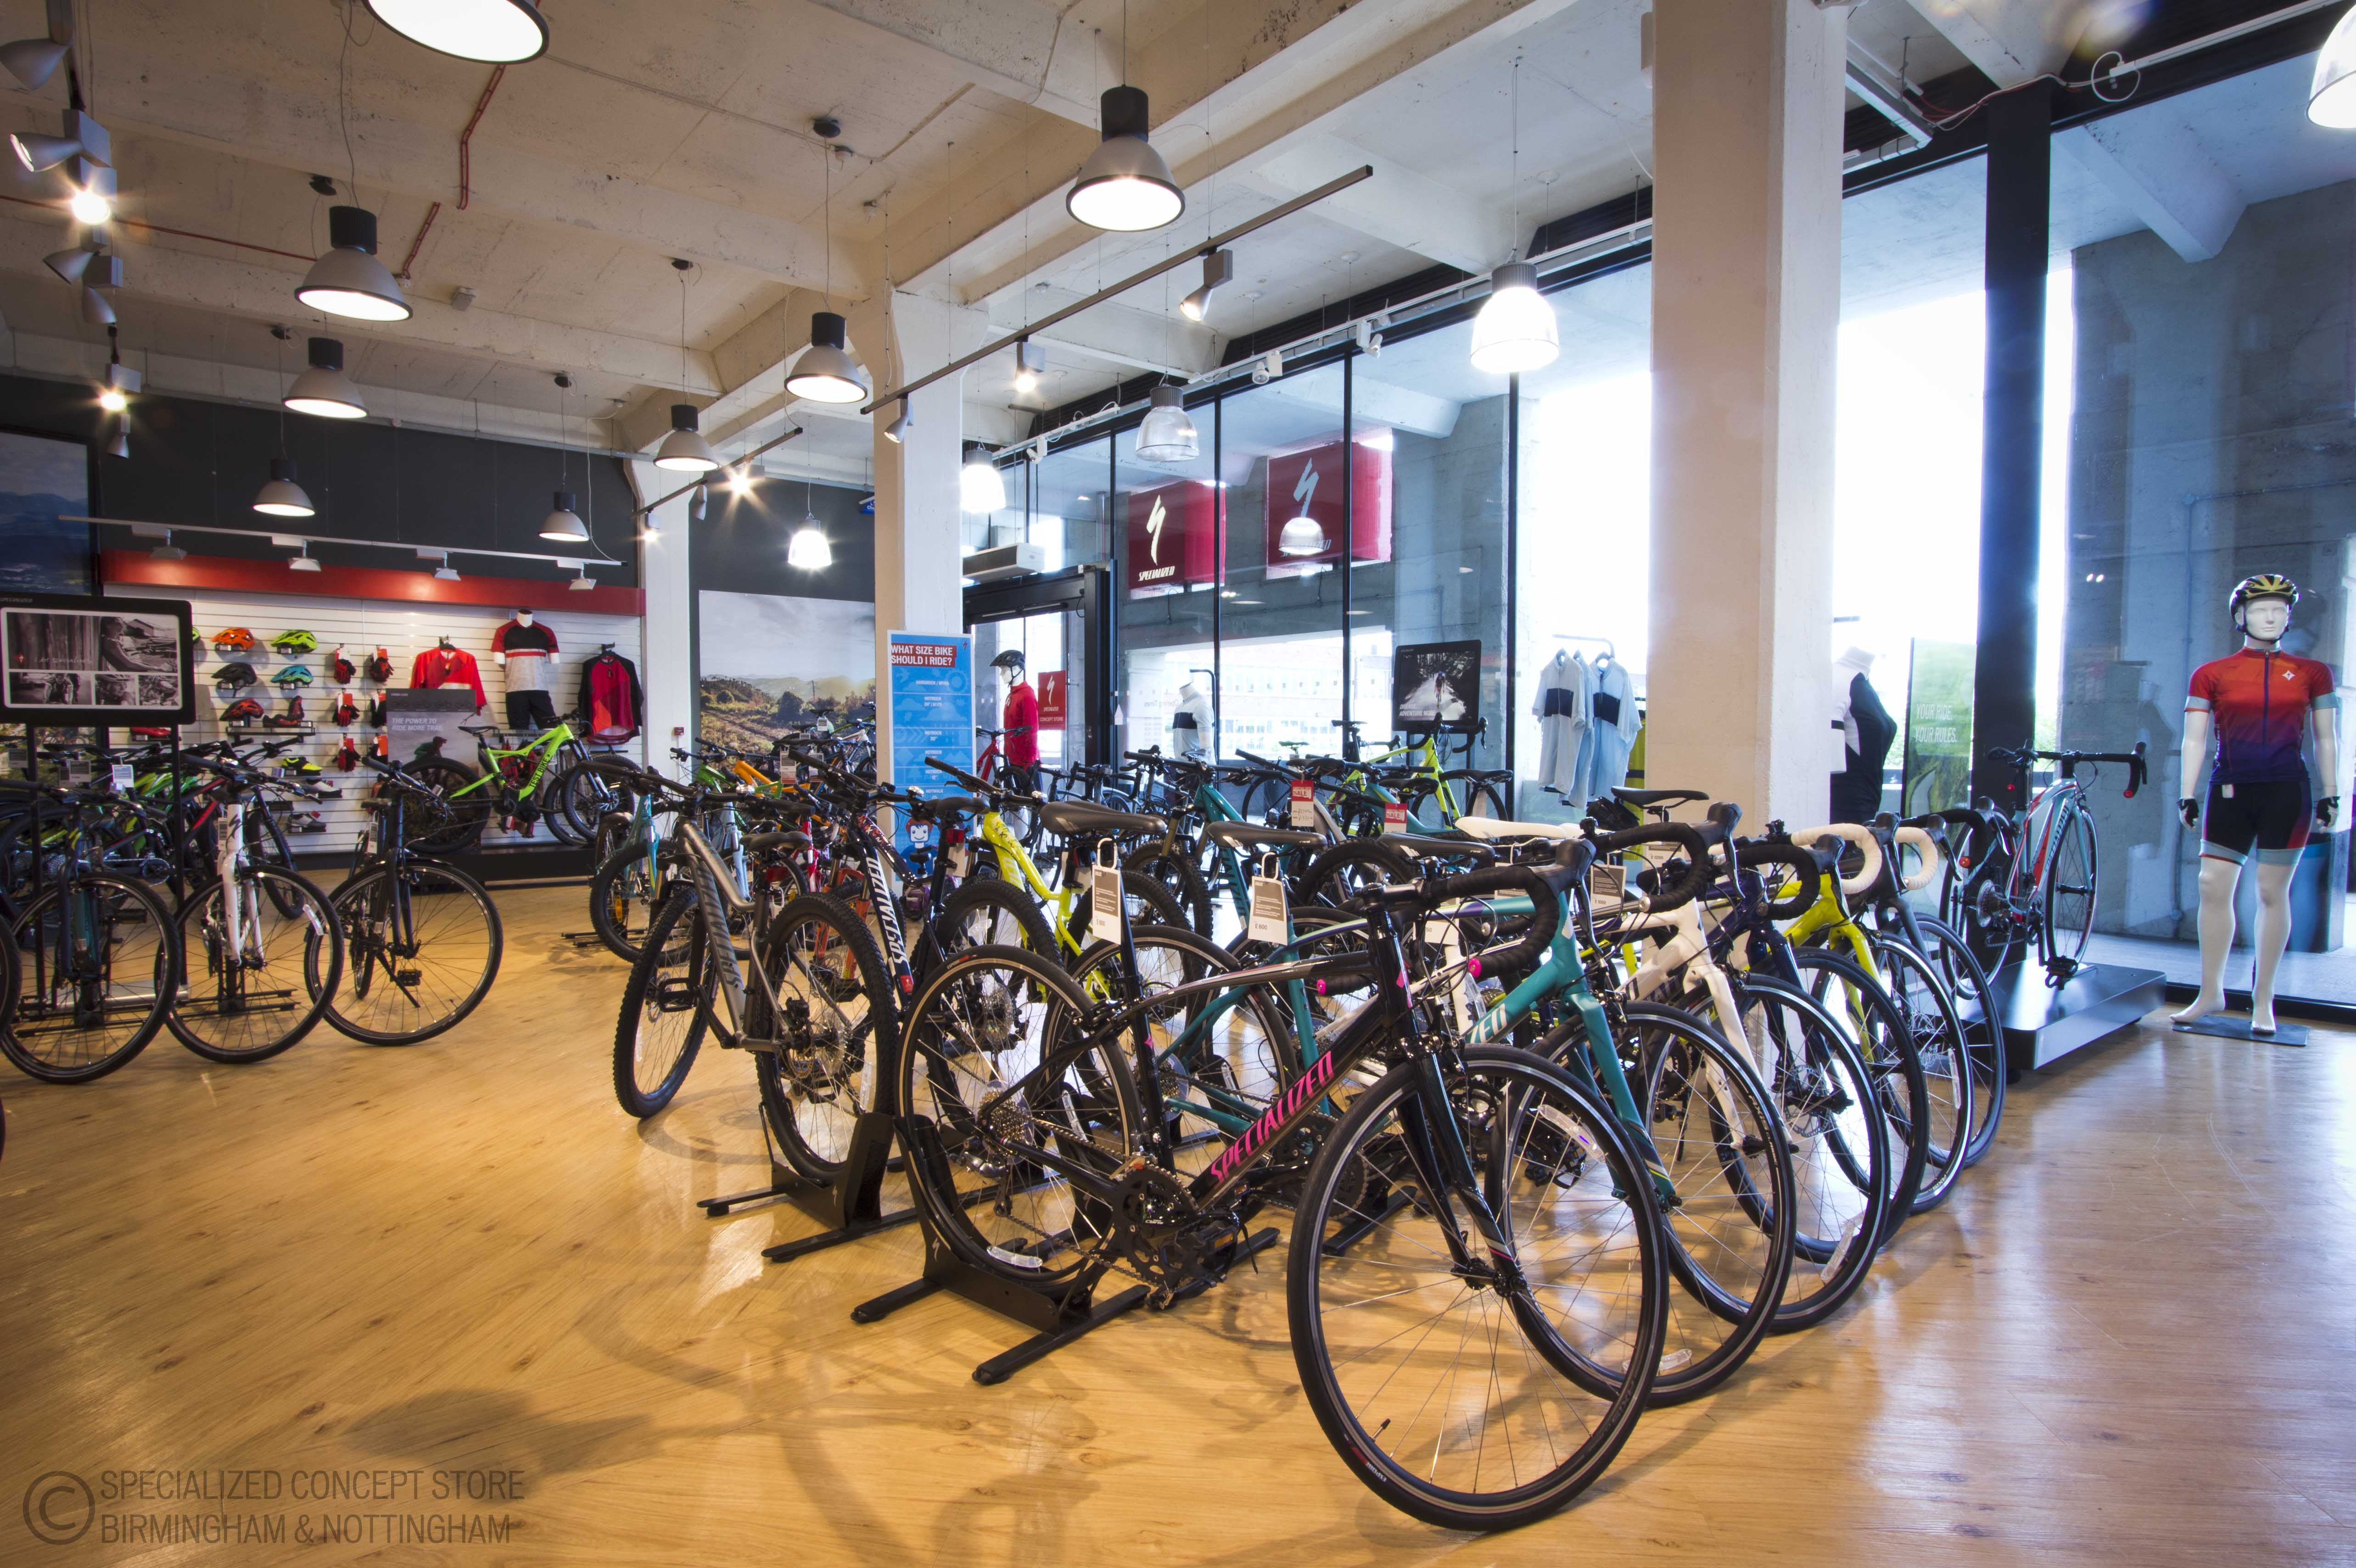 f4d7dd0690a Birmingham Specialized Concept Store - Bike Shop in Birmingham